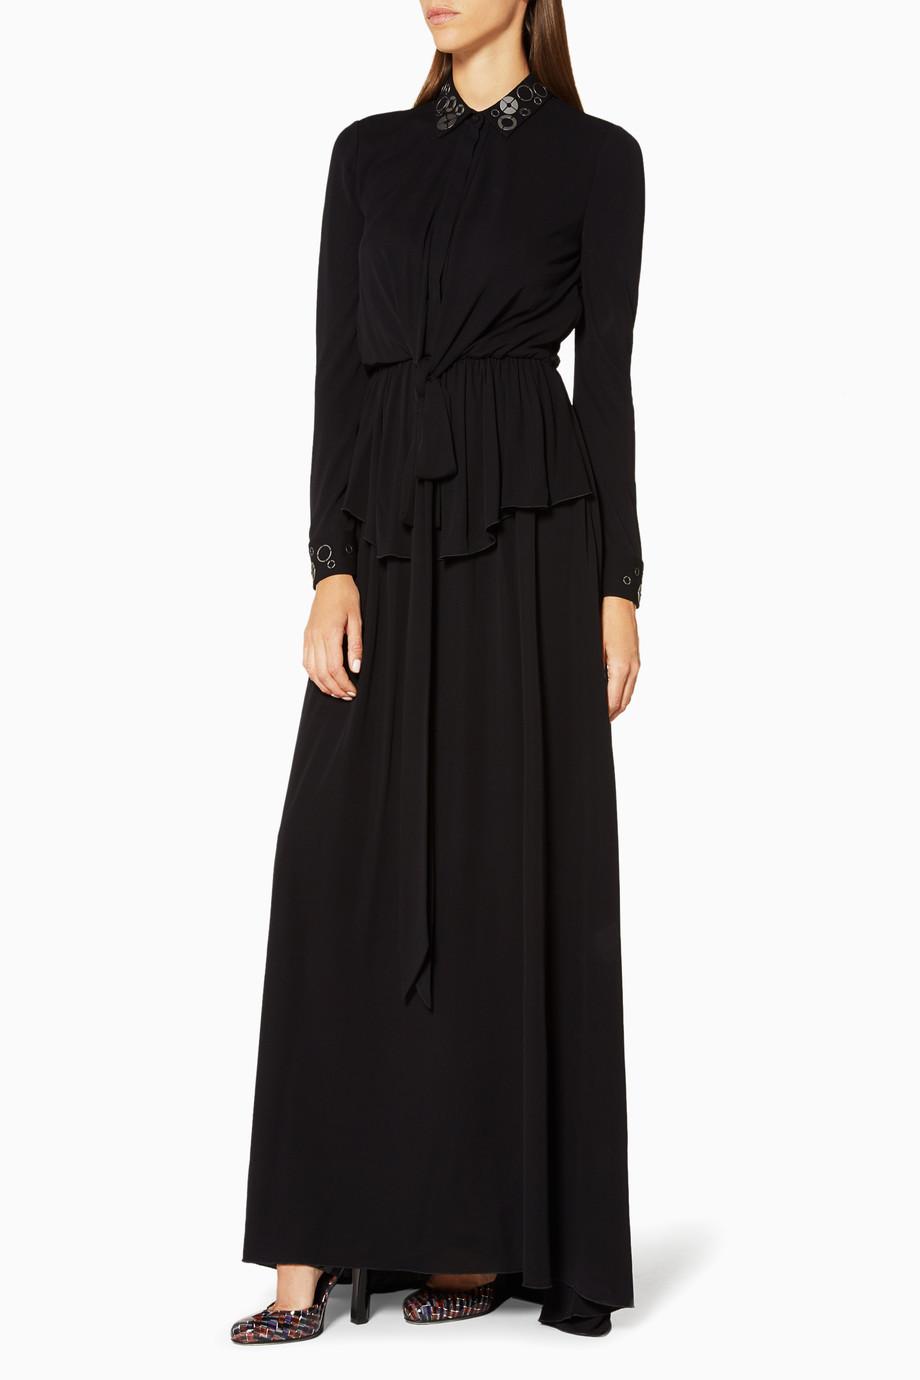 ba7ff8c60 تسوق فستان نافي كريب المطرز Bottega Veneta أزرق للنساء | اُناس السعودية